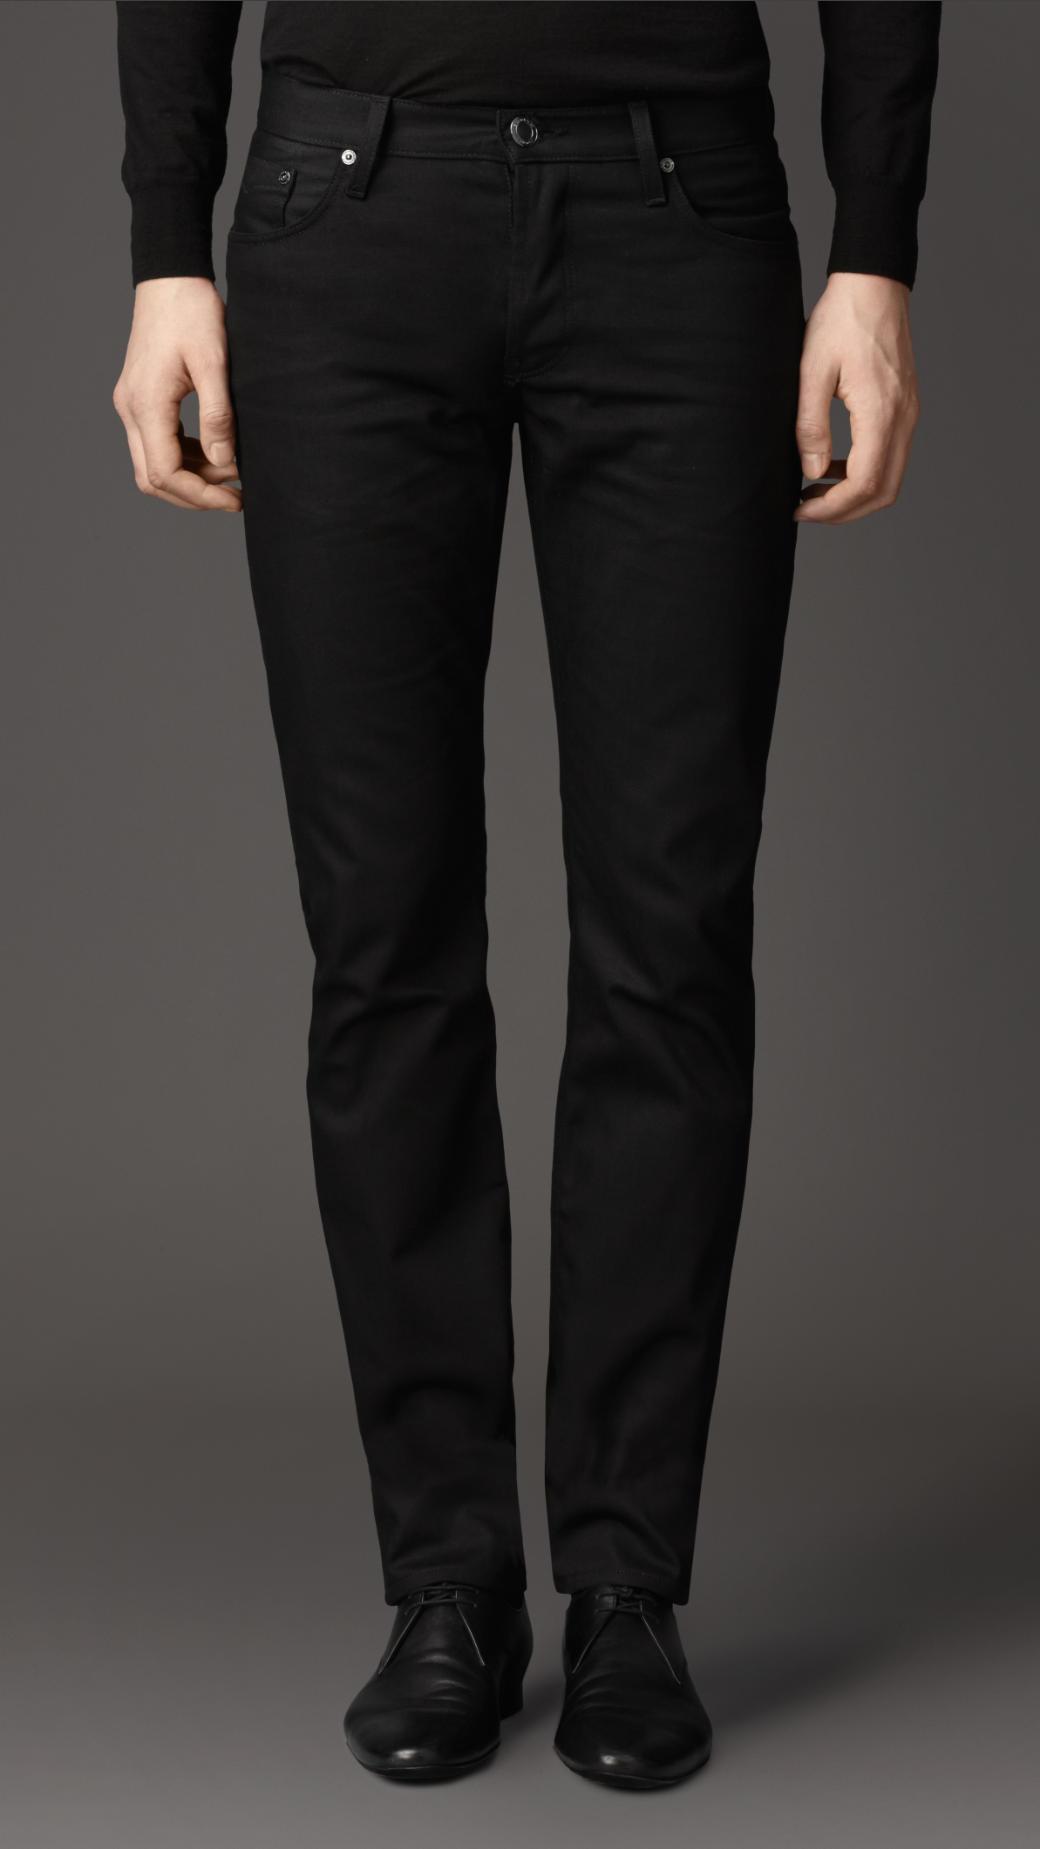 Burberry Steadman Black Slim Fit Jeans in Black for Men | Lyst